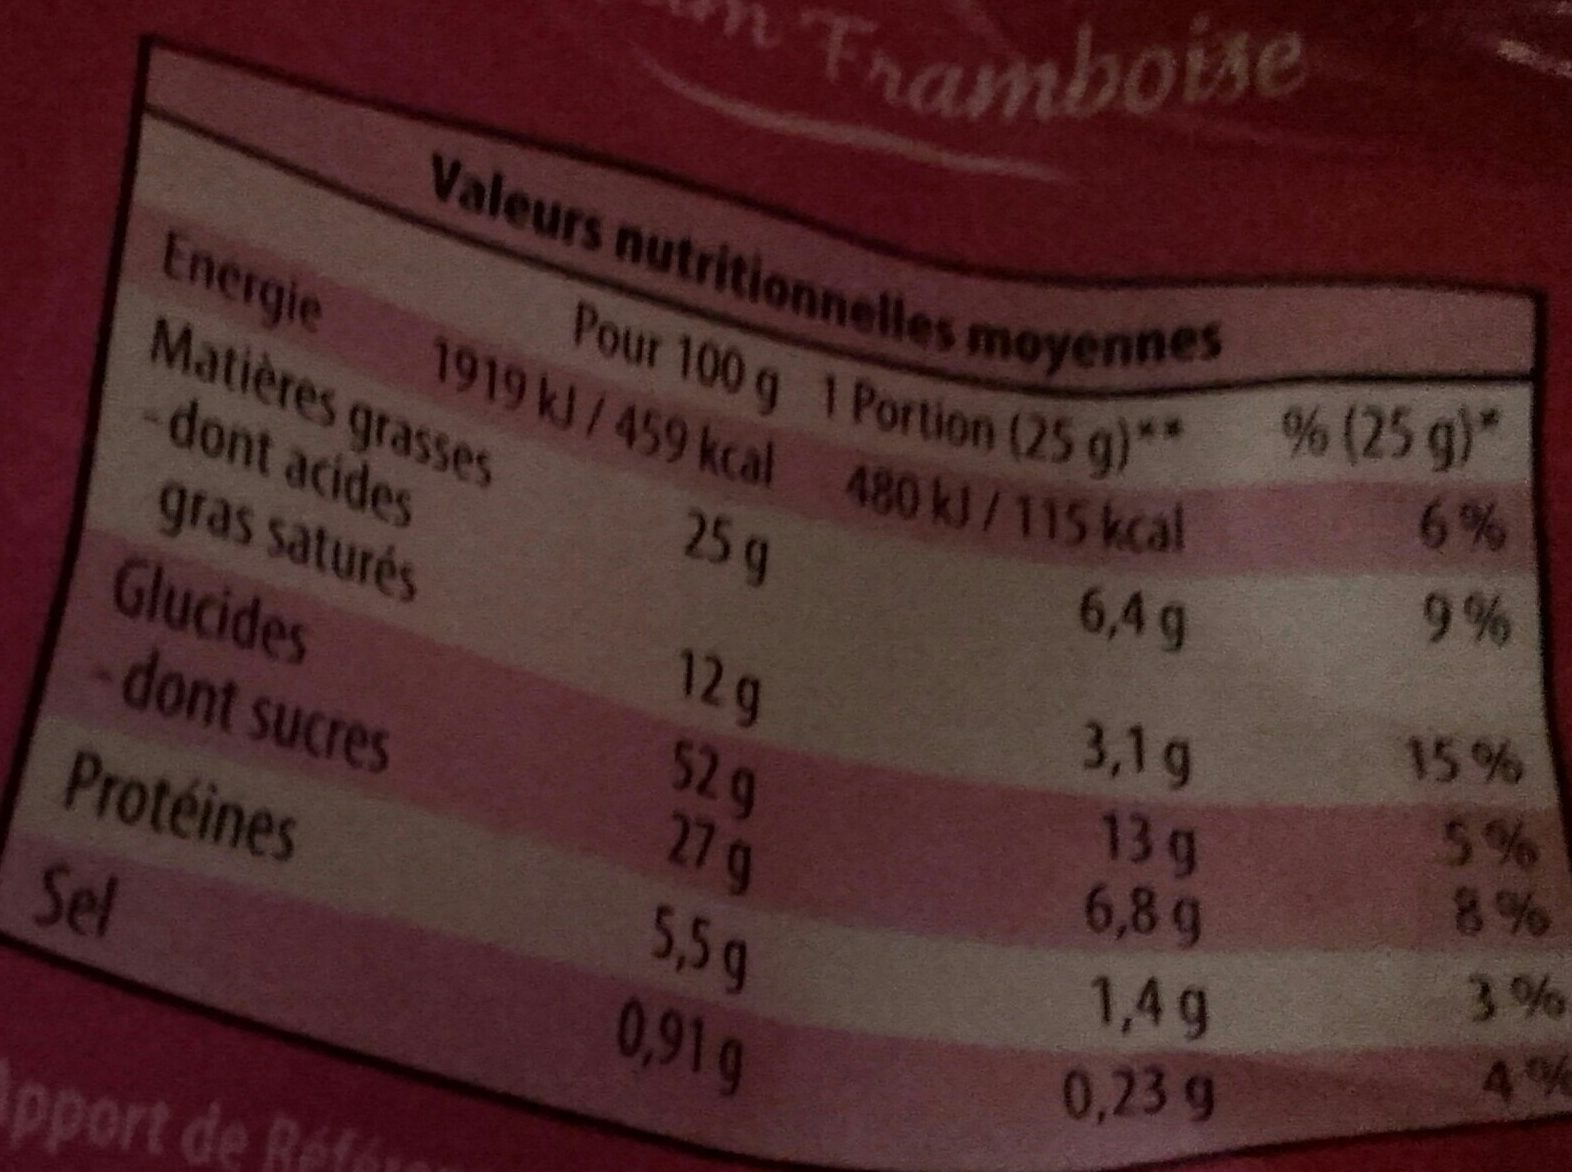 Madeleines parfum framboise - Informations nutritionnelles